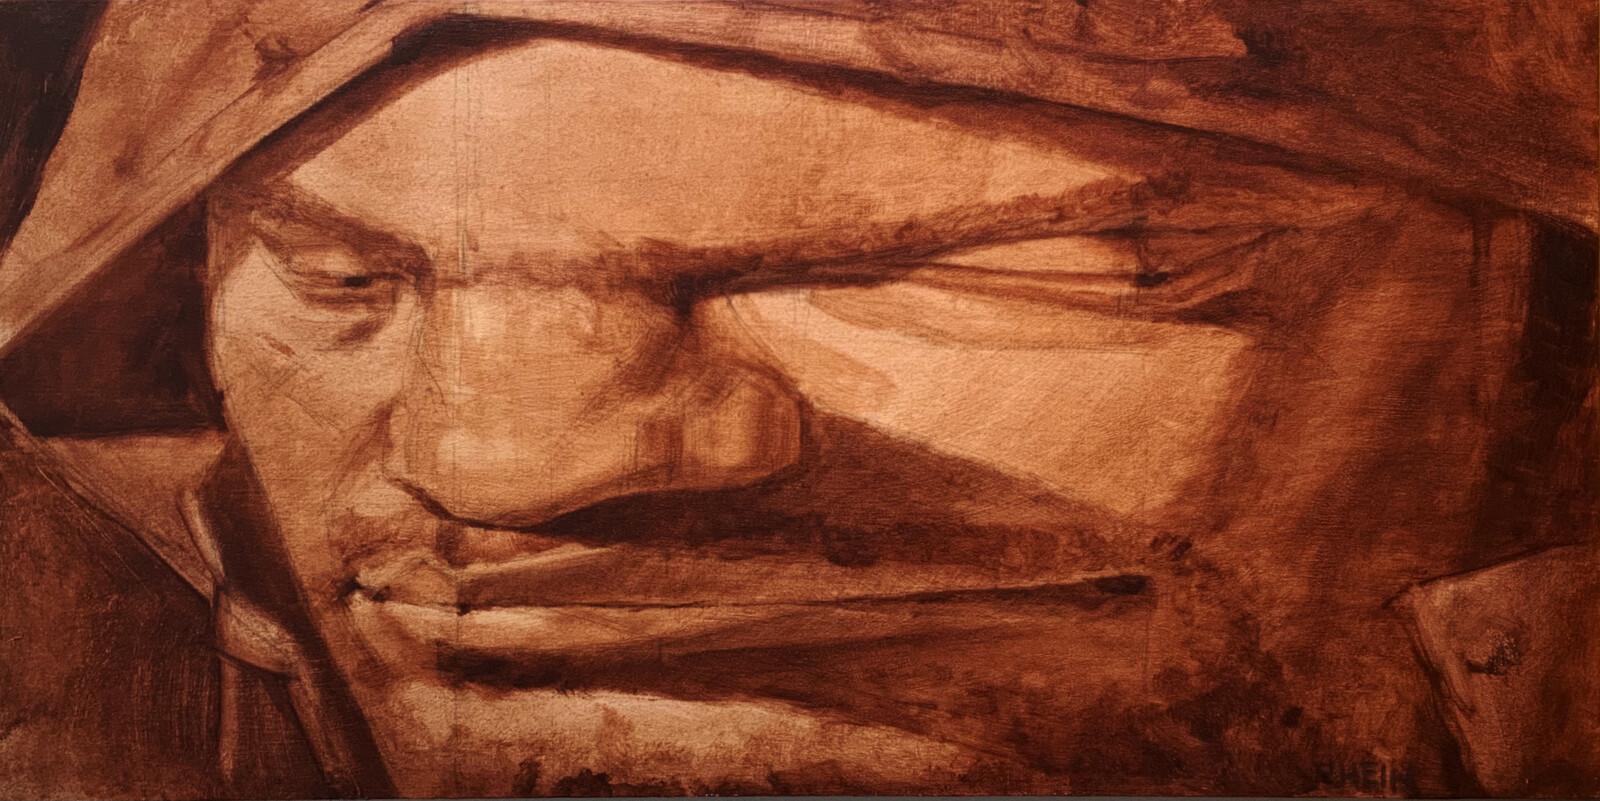 Oil on panel - 20x10